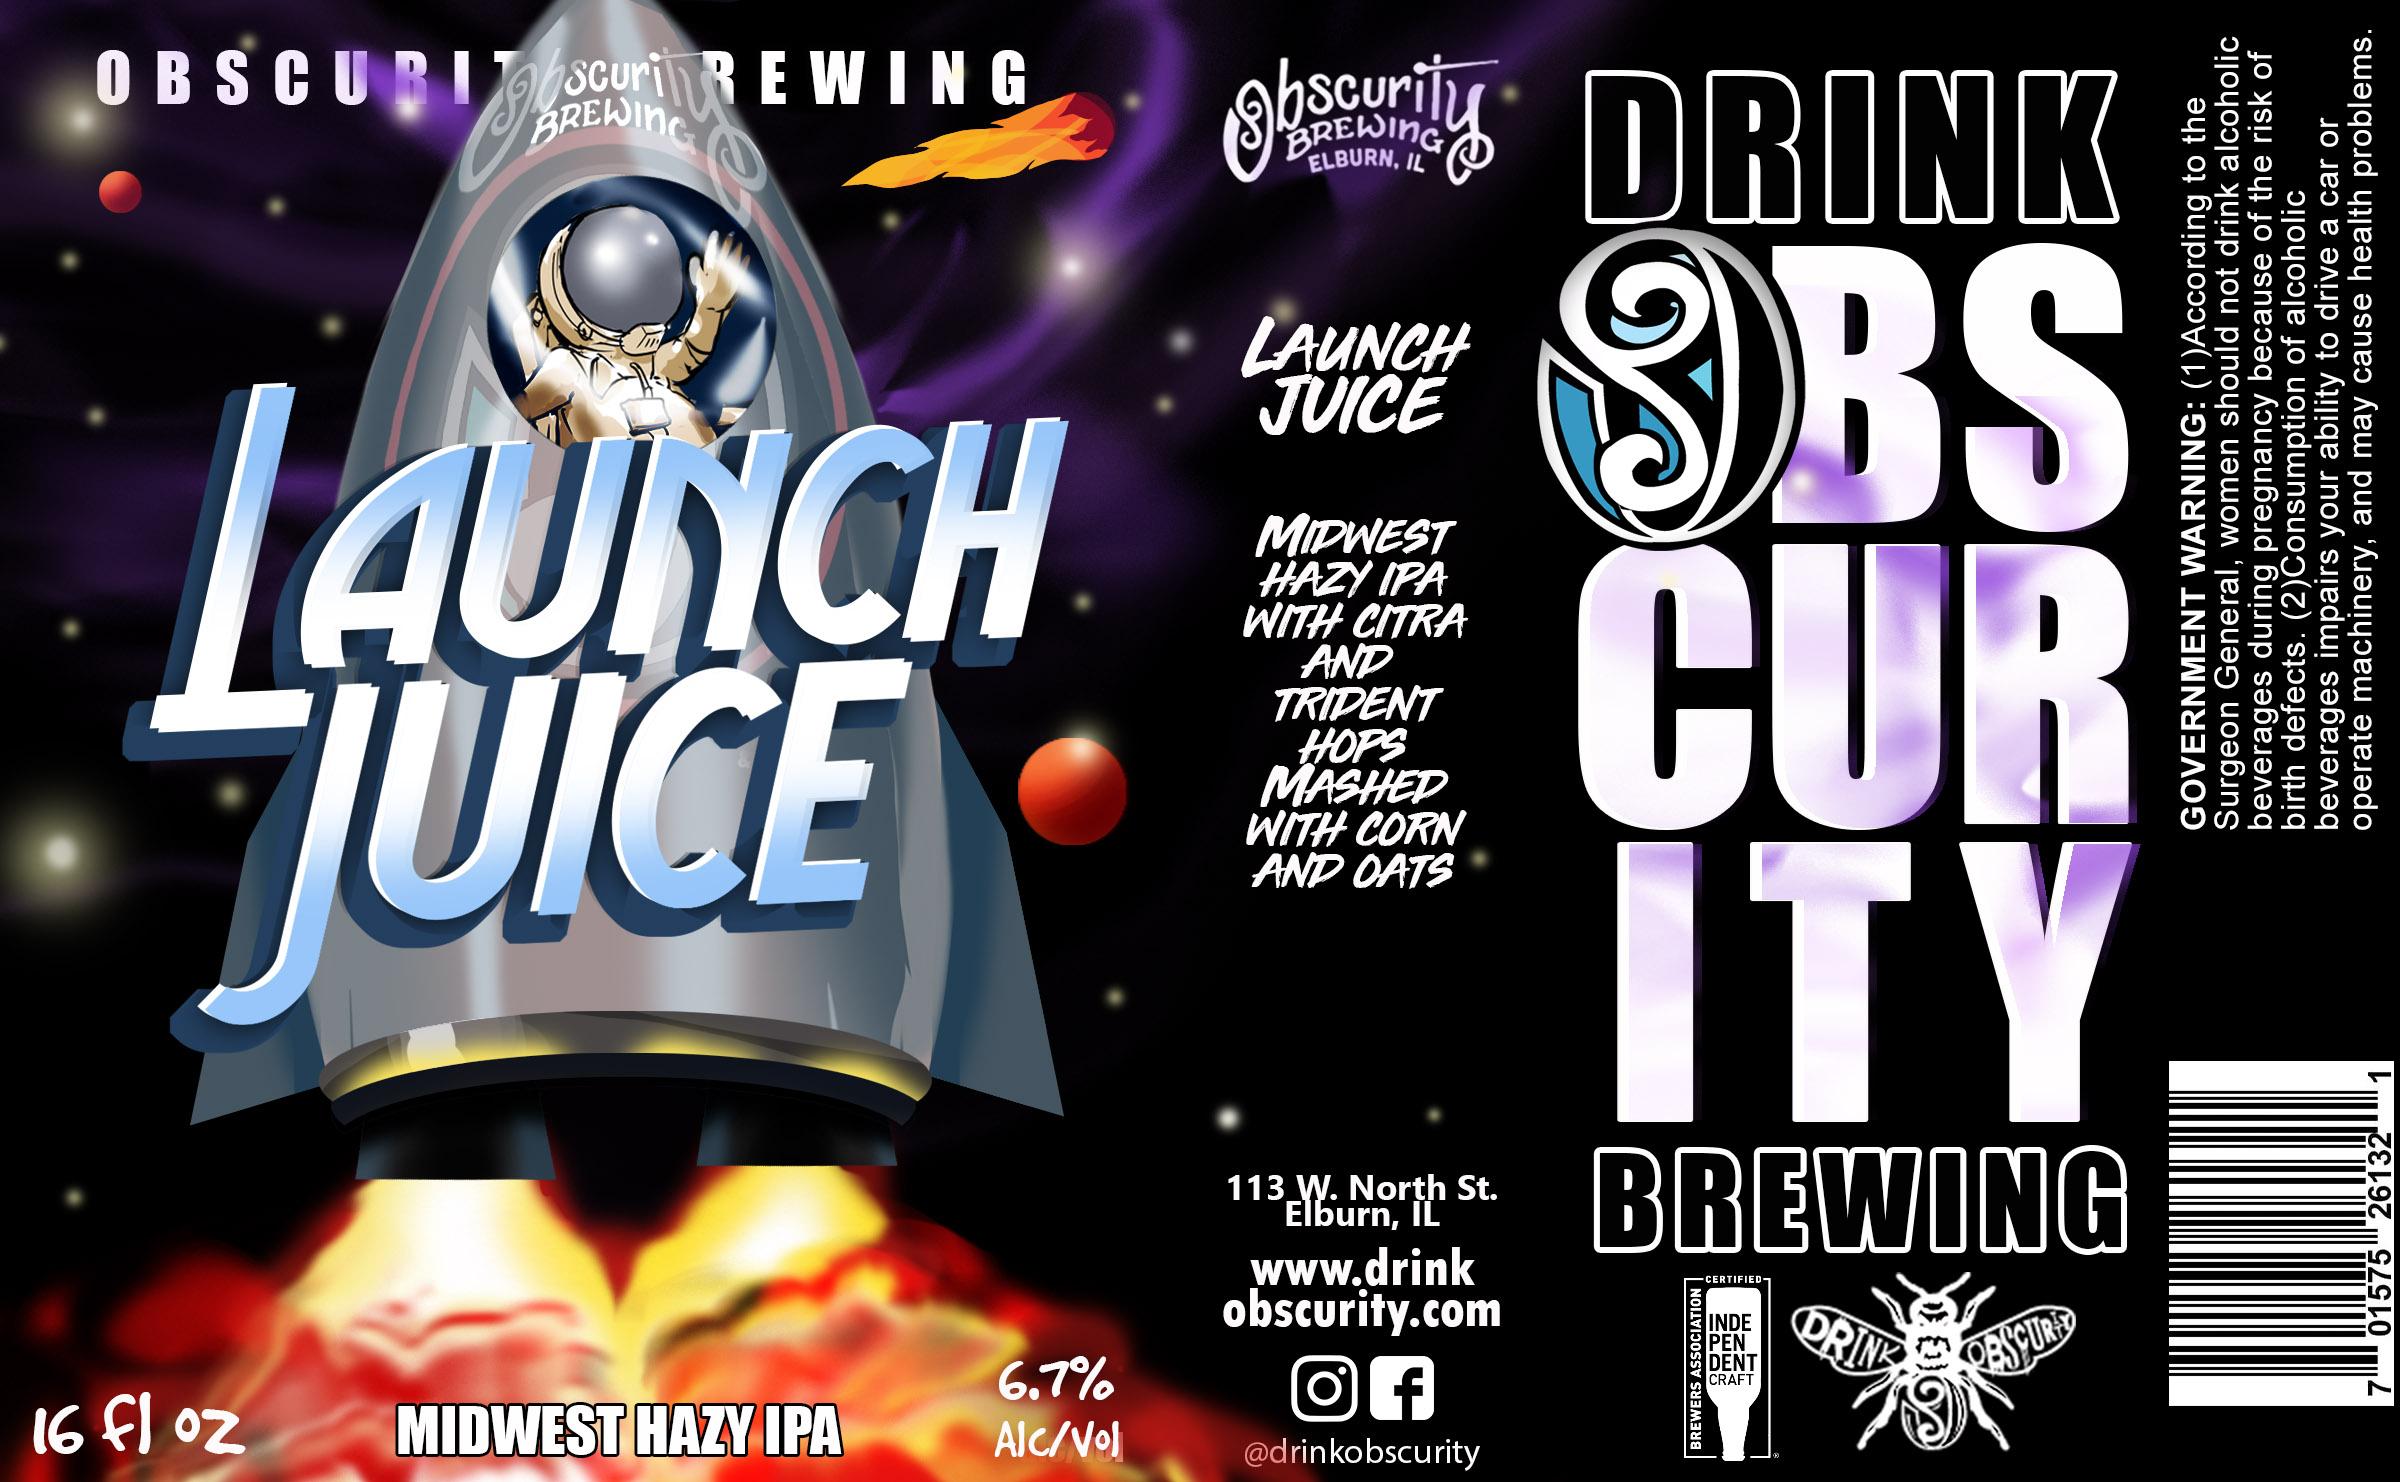 Launch Juice